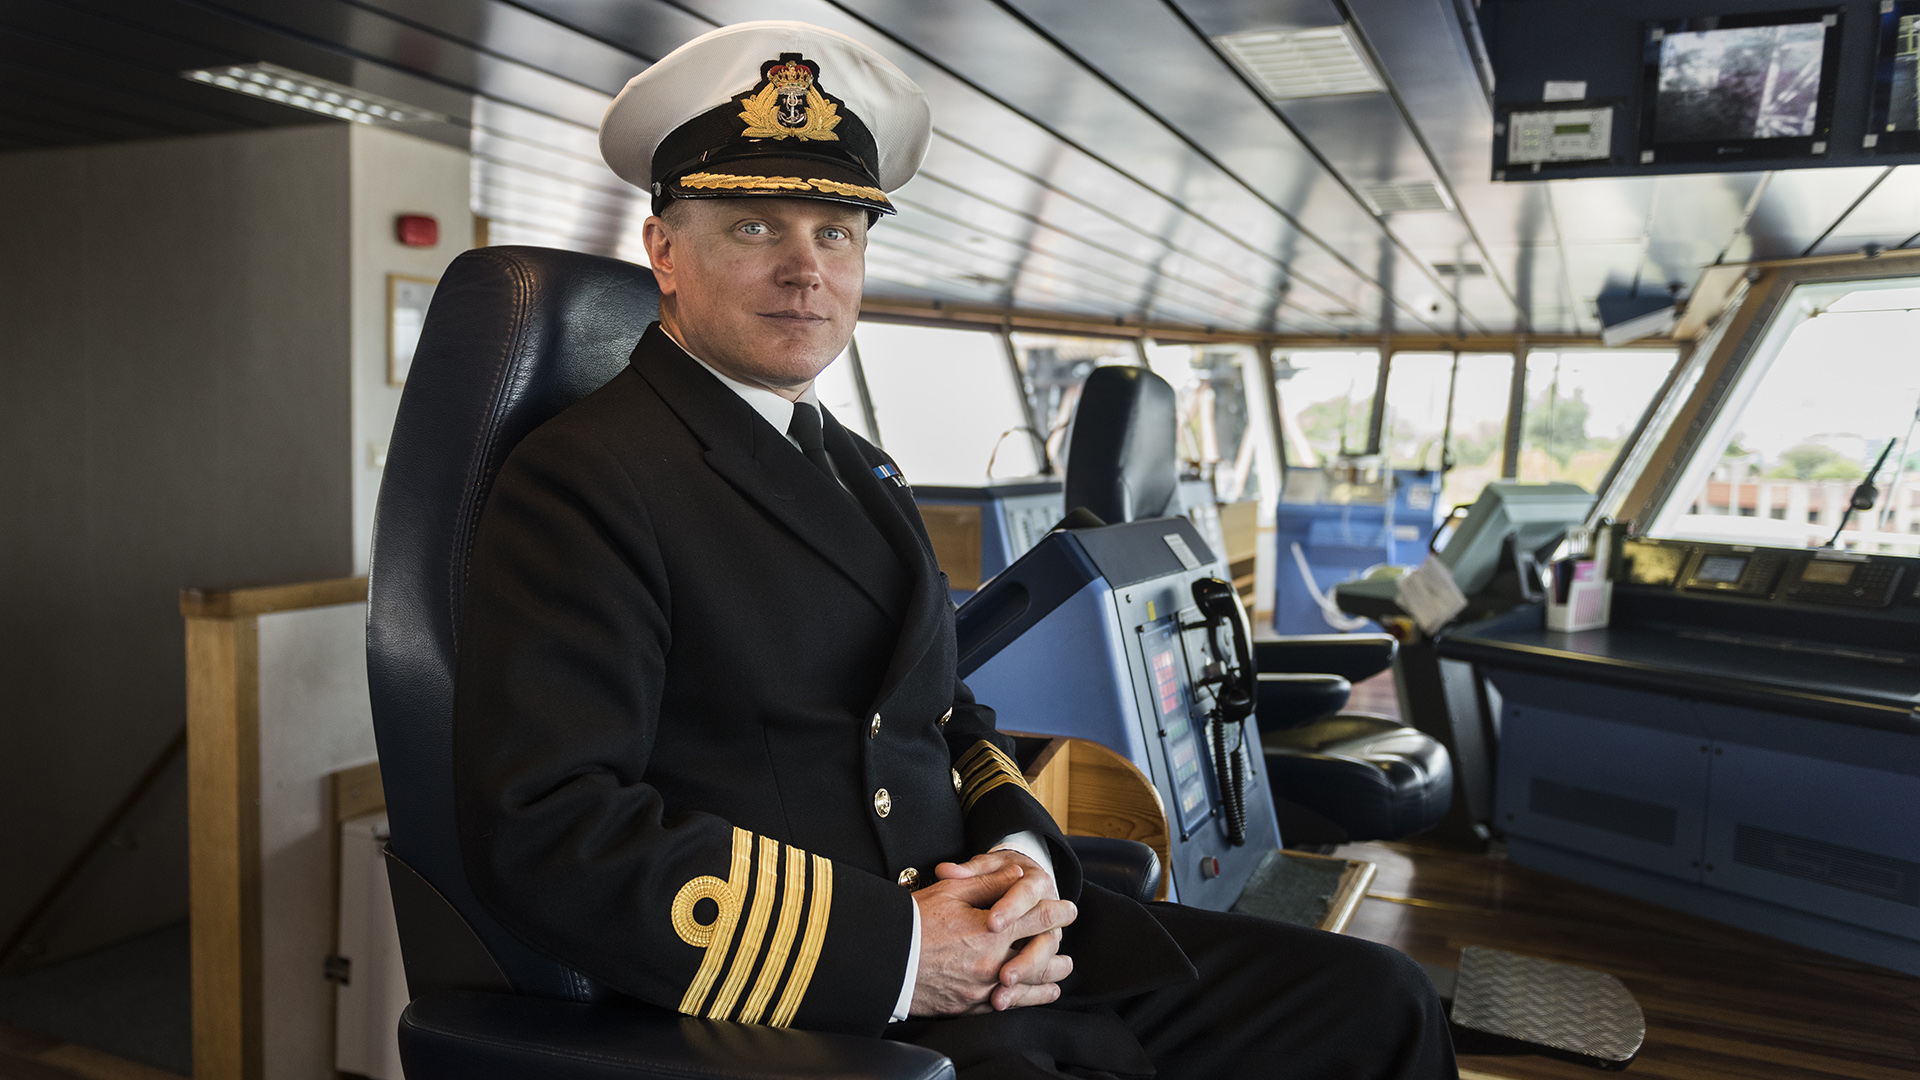 El capitán del barco,Matt Syrett